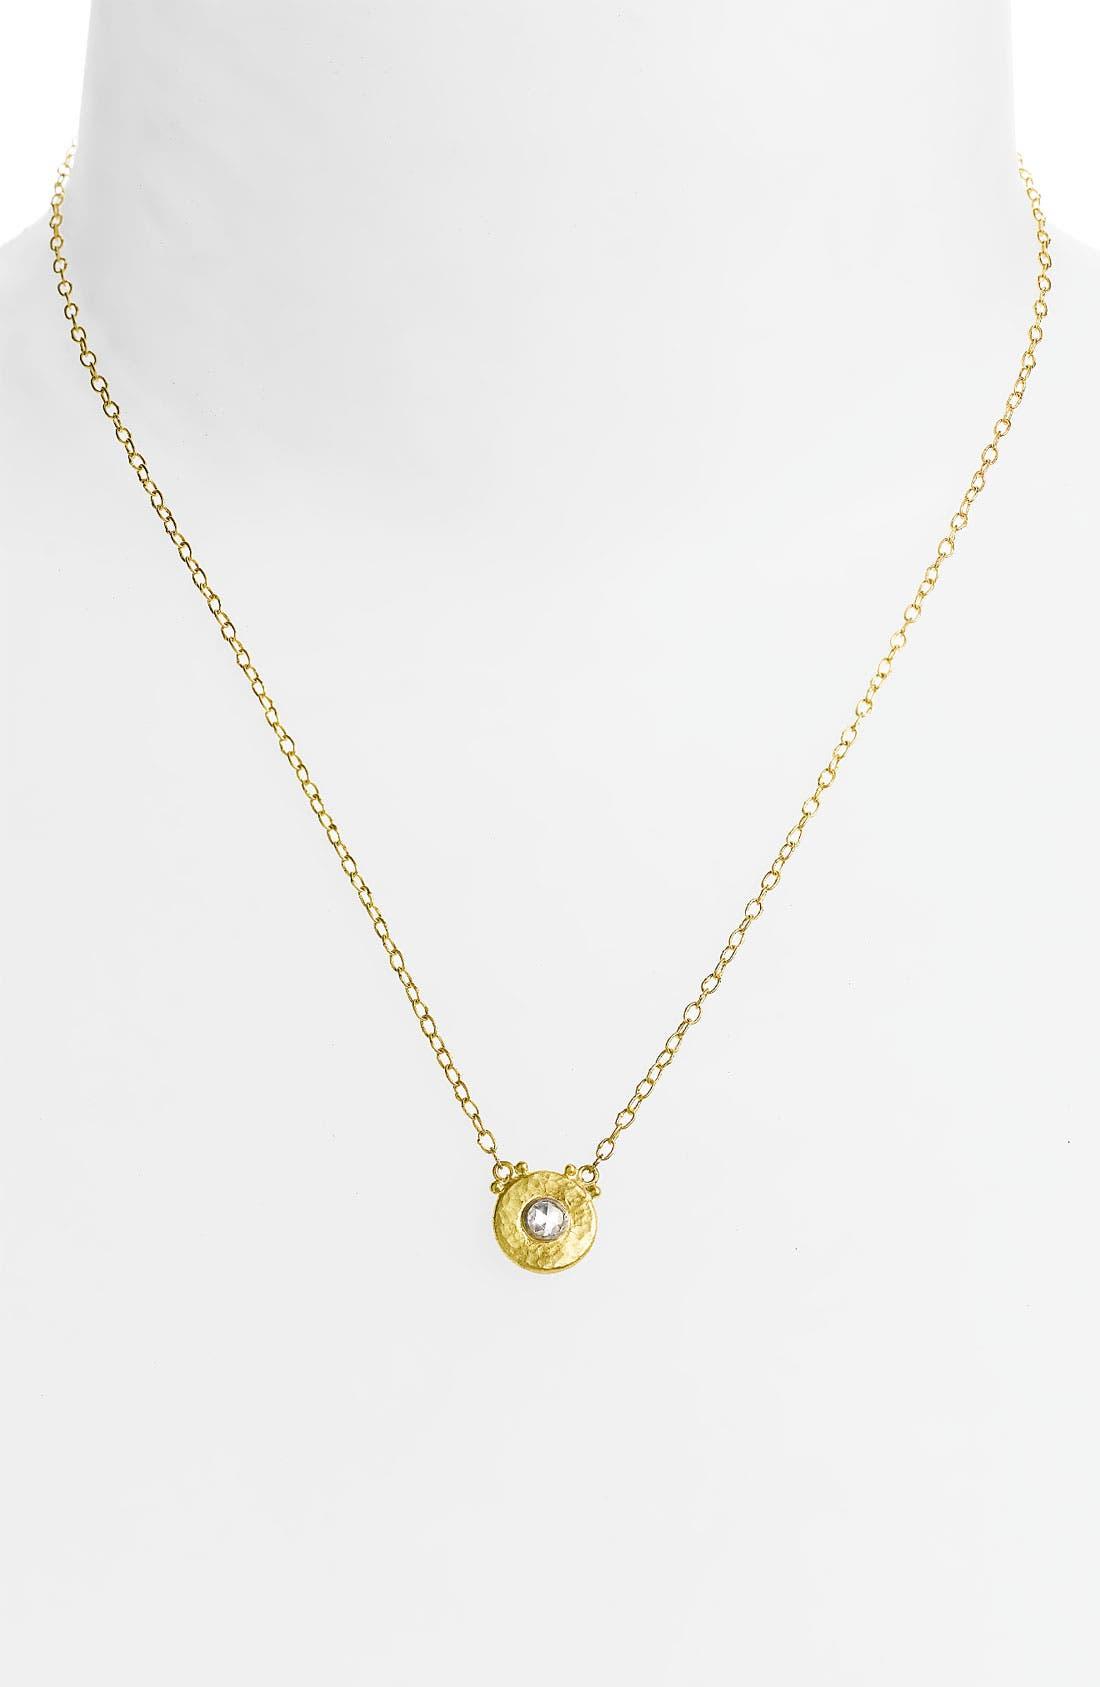 Main Image - Gurhan 'Droplet' Diamond Pendant Necklace